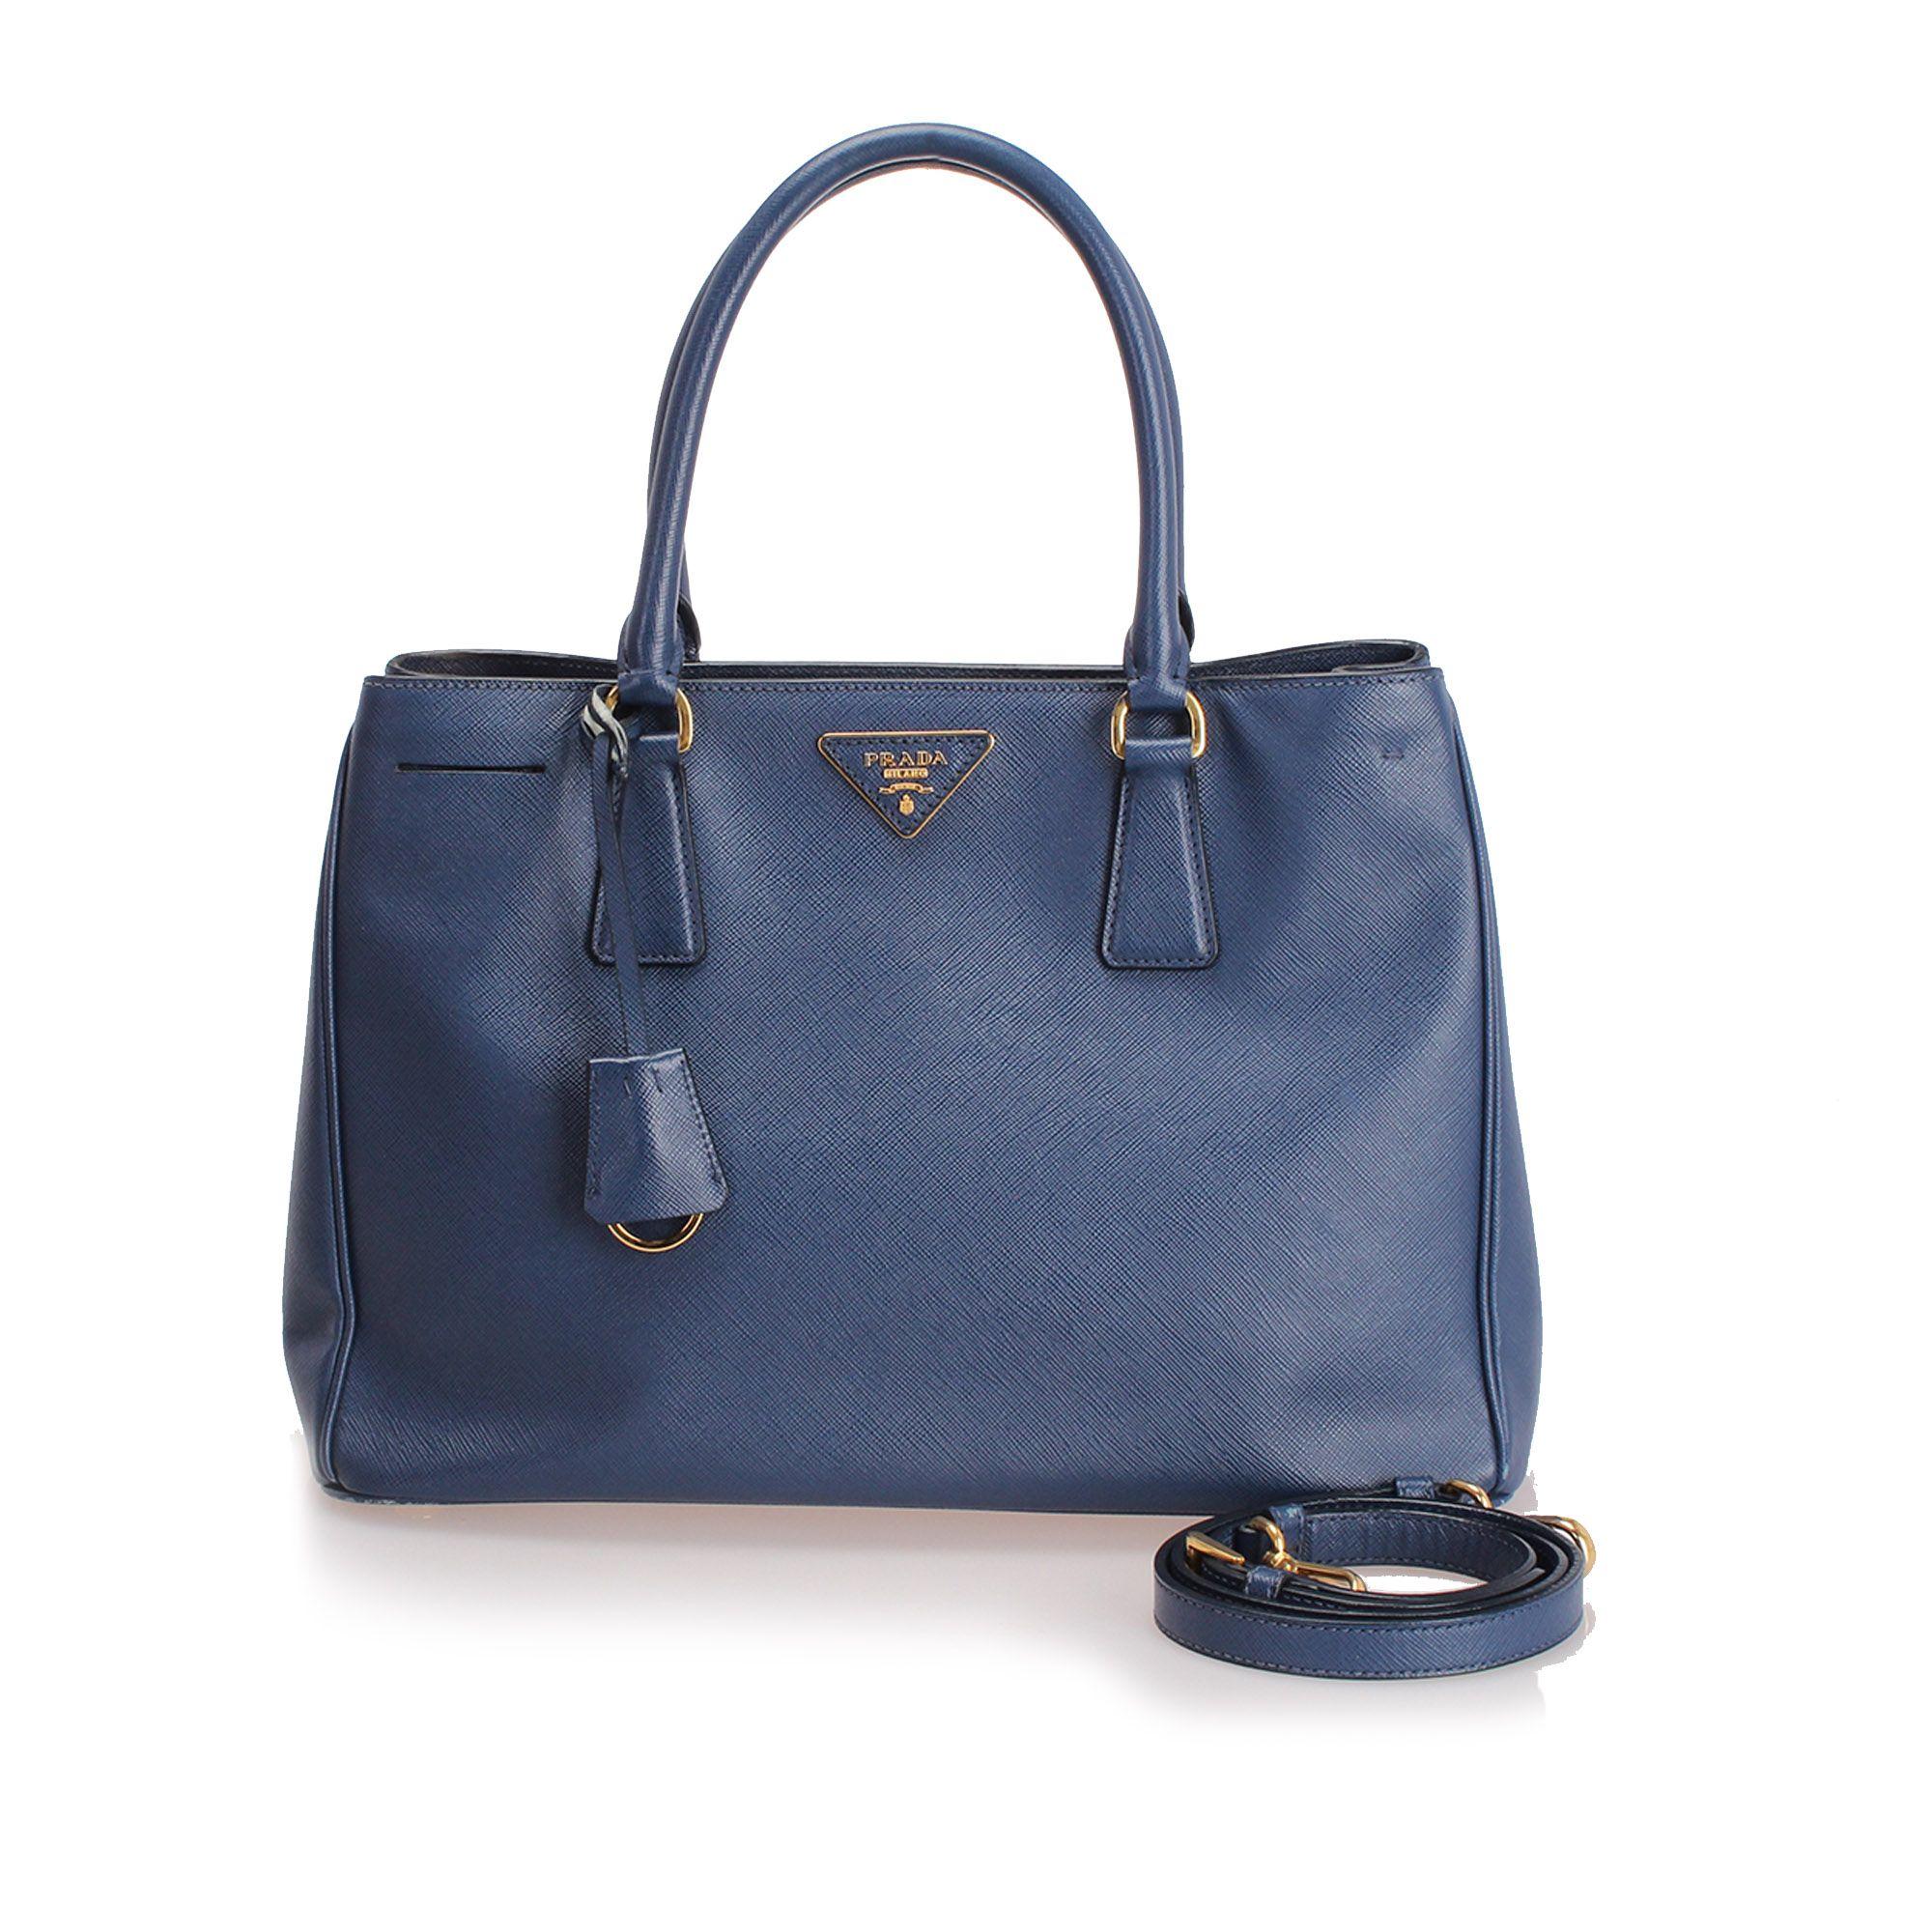 Vintage Prada Saffiano Galleria Satchel Blue